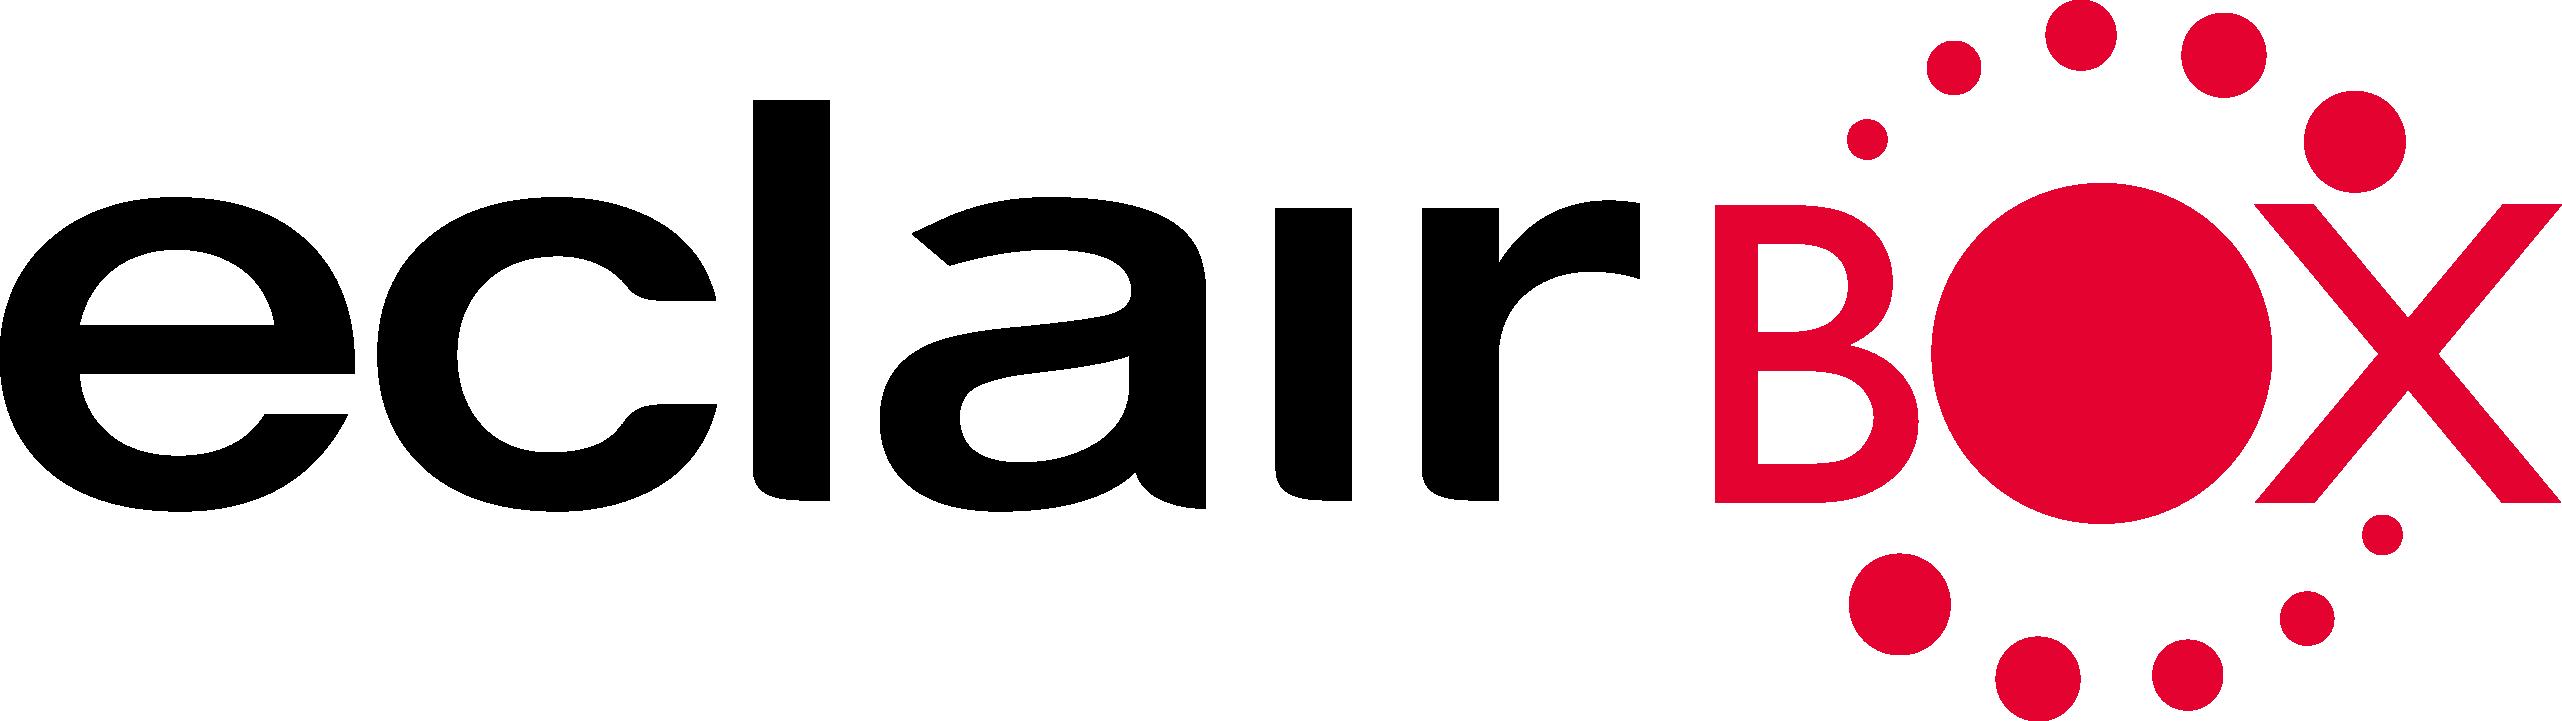 6bdf7e2c-b754-40dd-98e2-073d41583a78.png